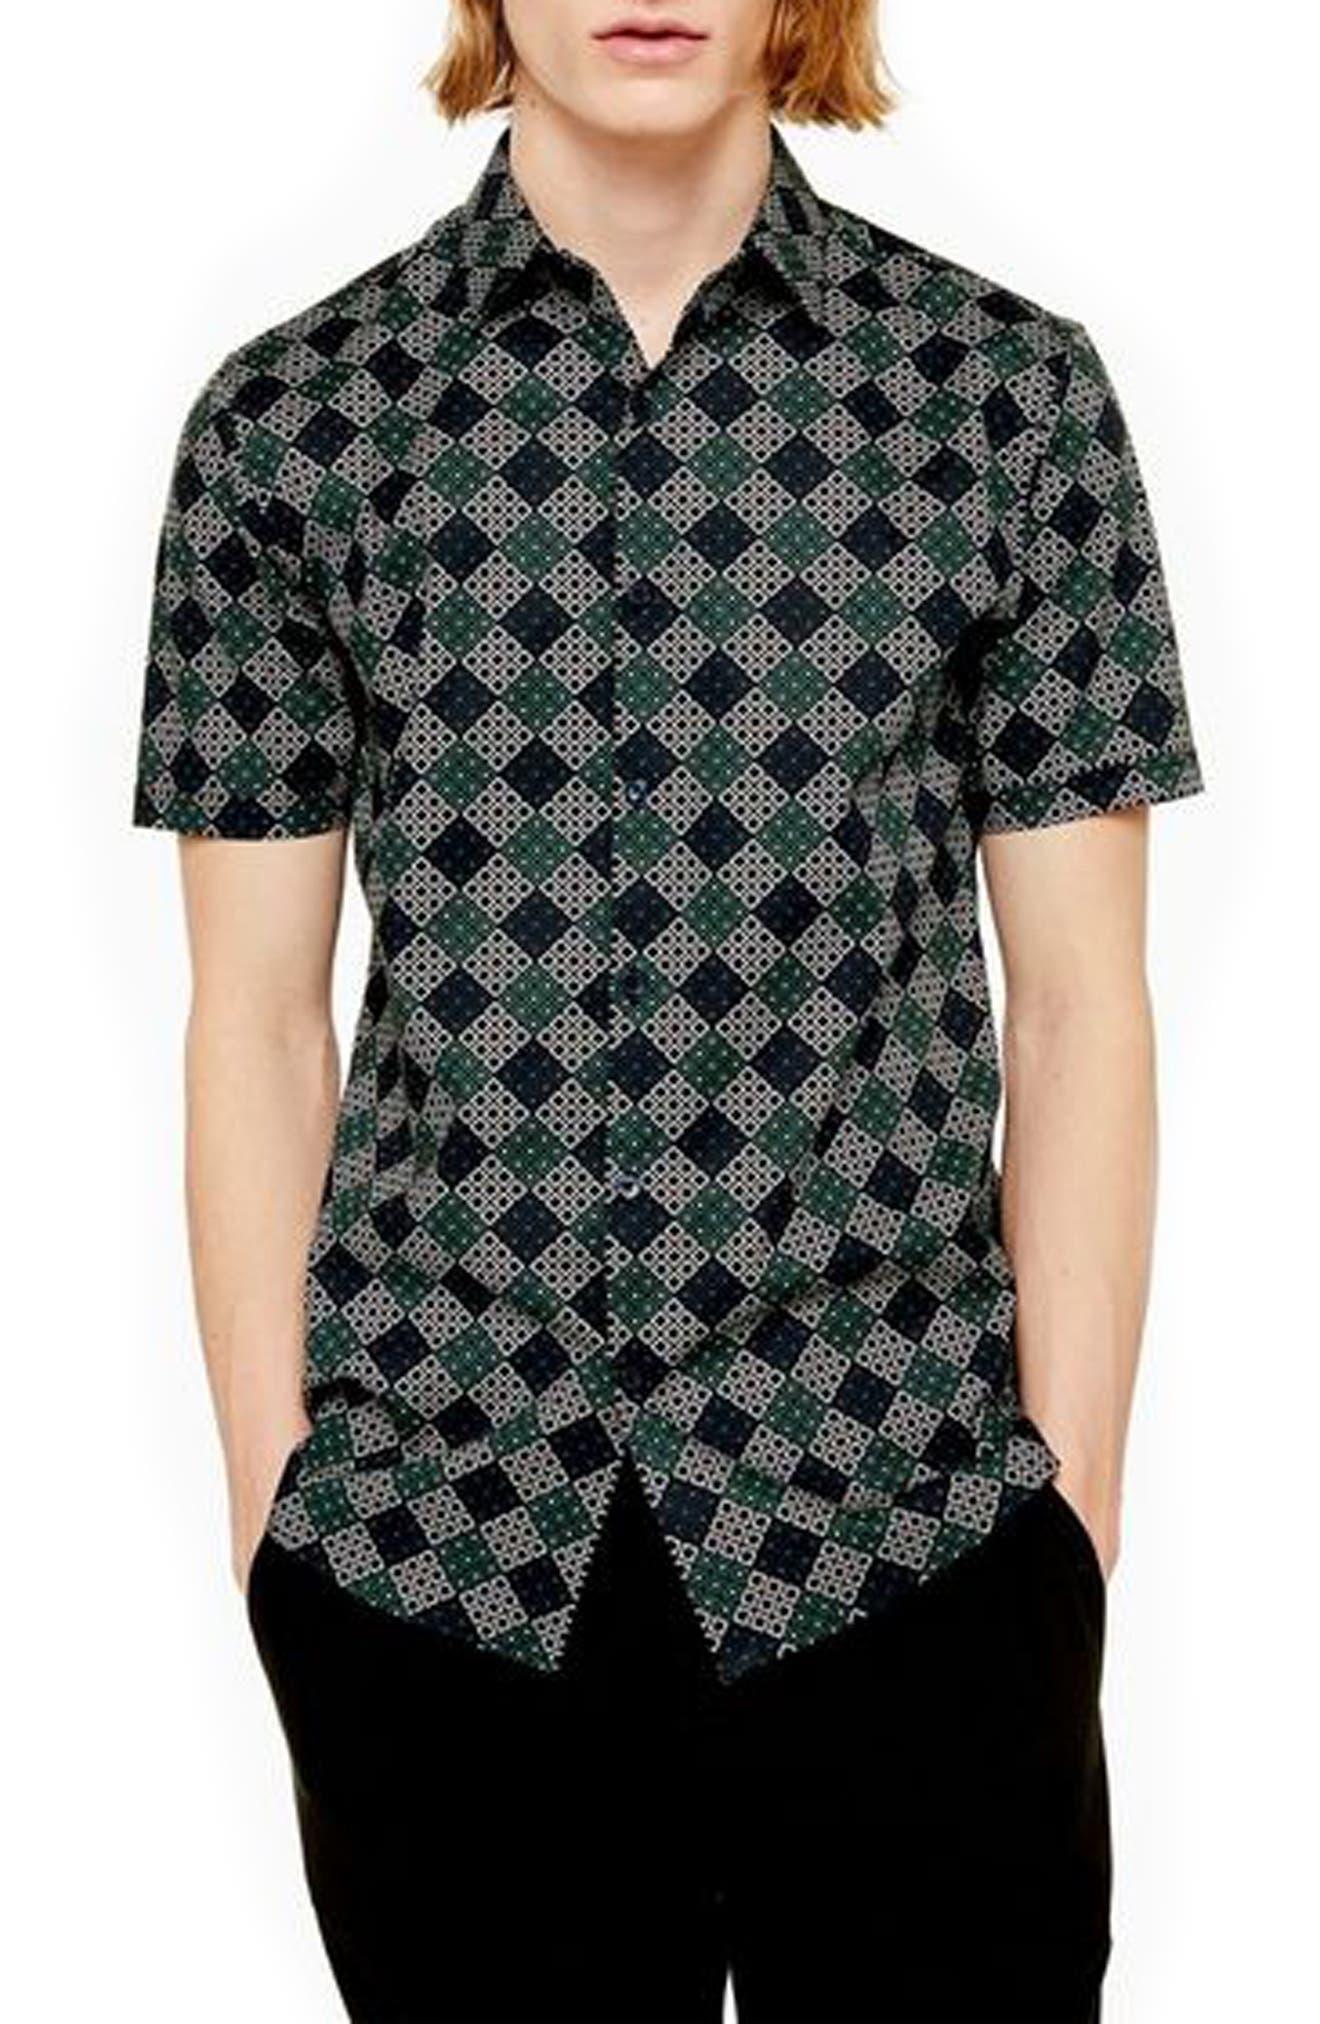 1960s -1970s Men's Clothing Mens Topman Trim Fit Geometric Print Short Sleeve Button-Up Shirt $55.00 AT vintagedancer.com